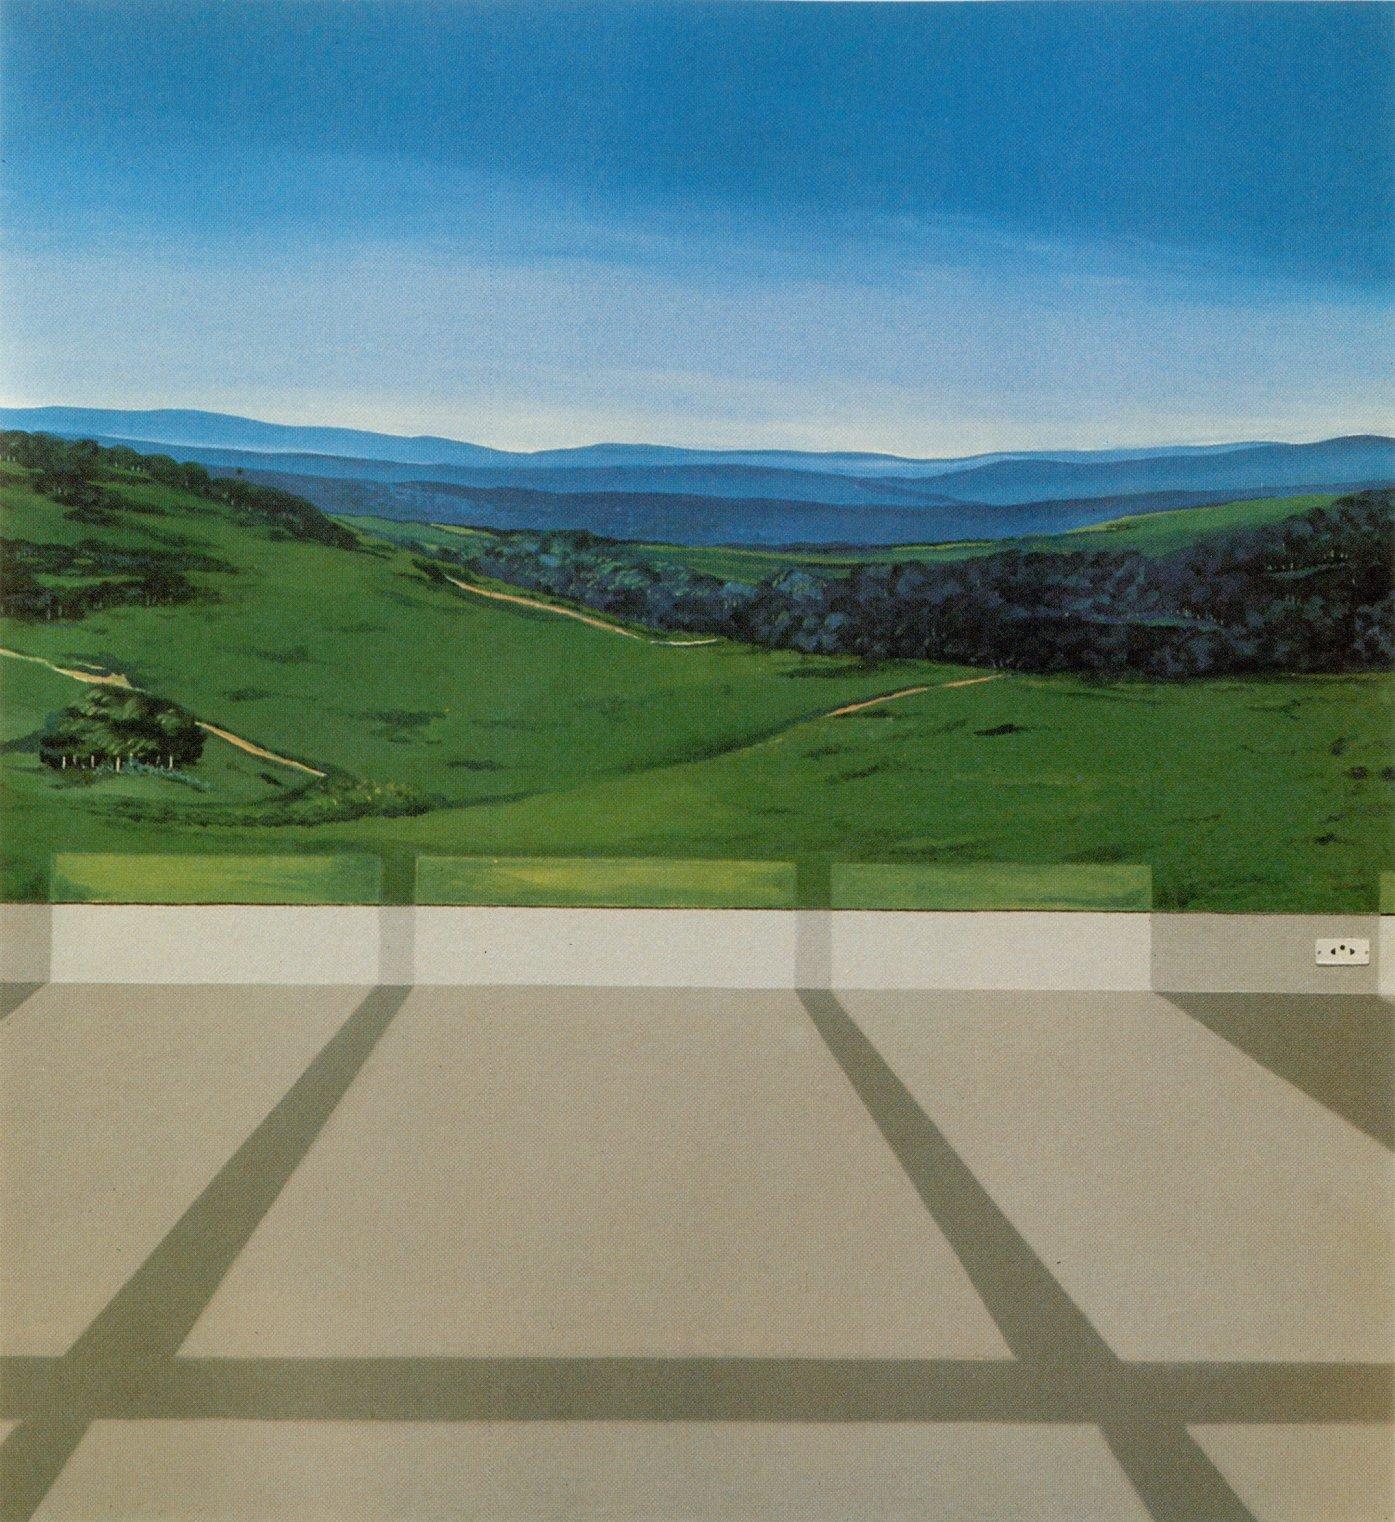 Image (1974) - Cybèle Varela